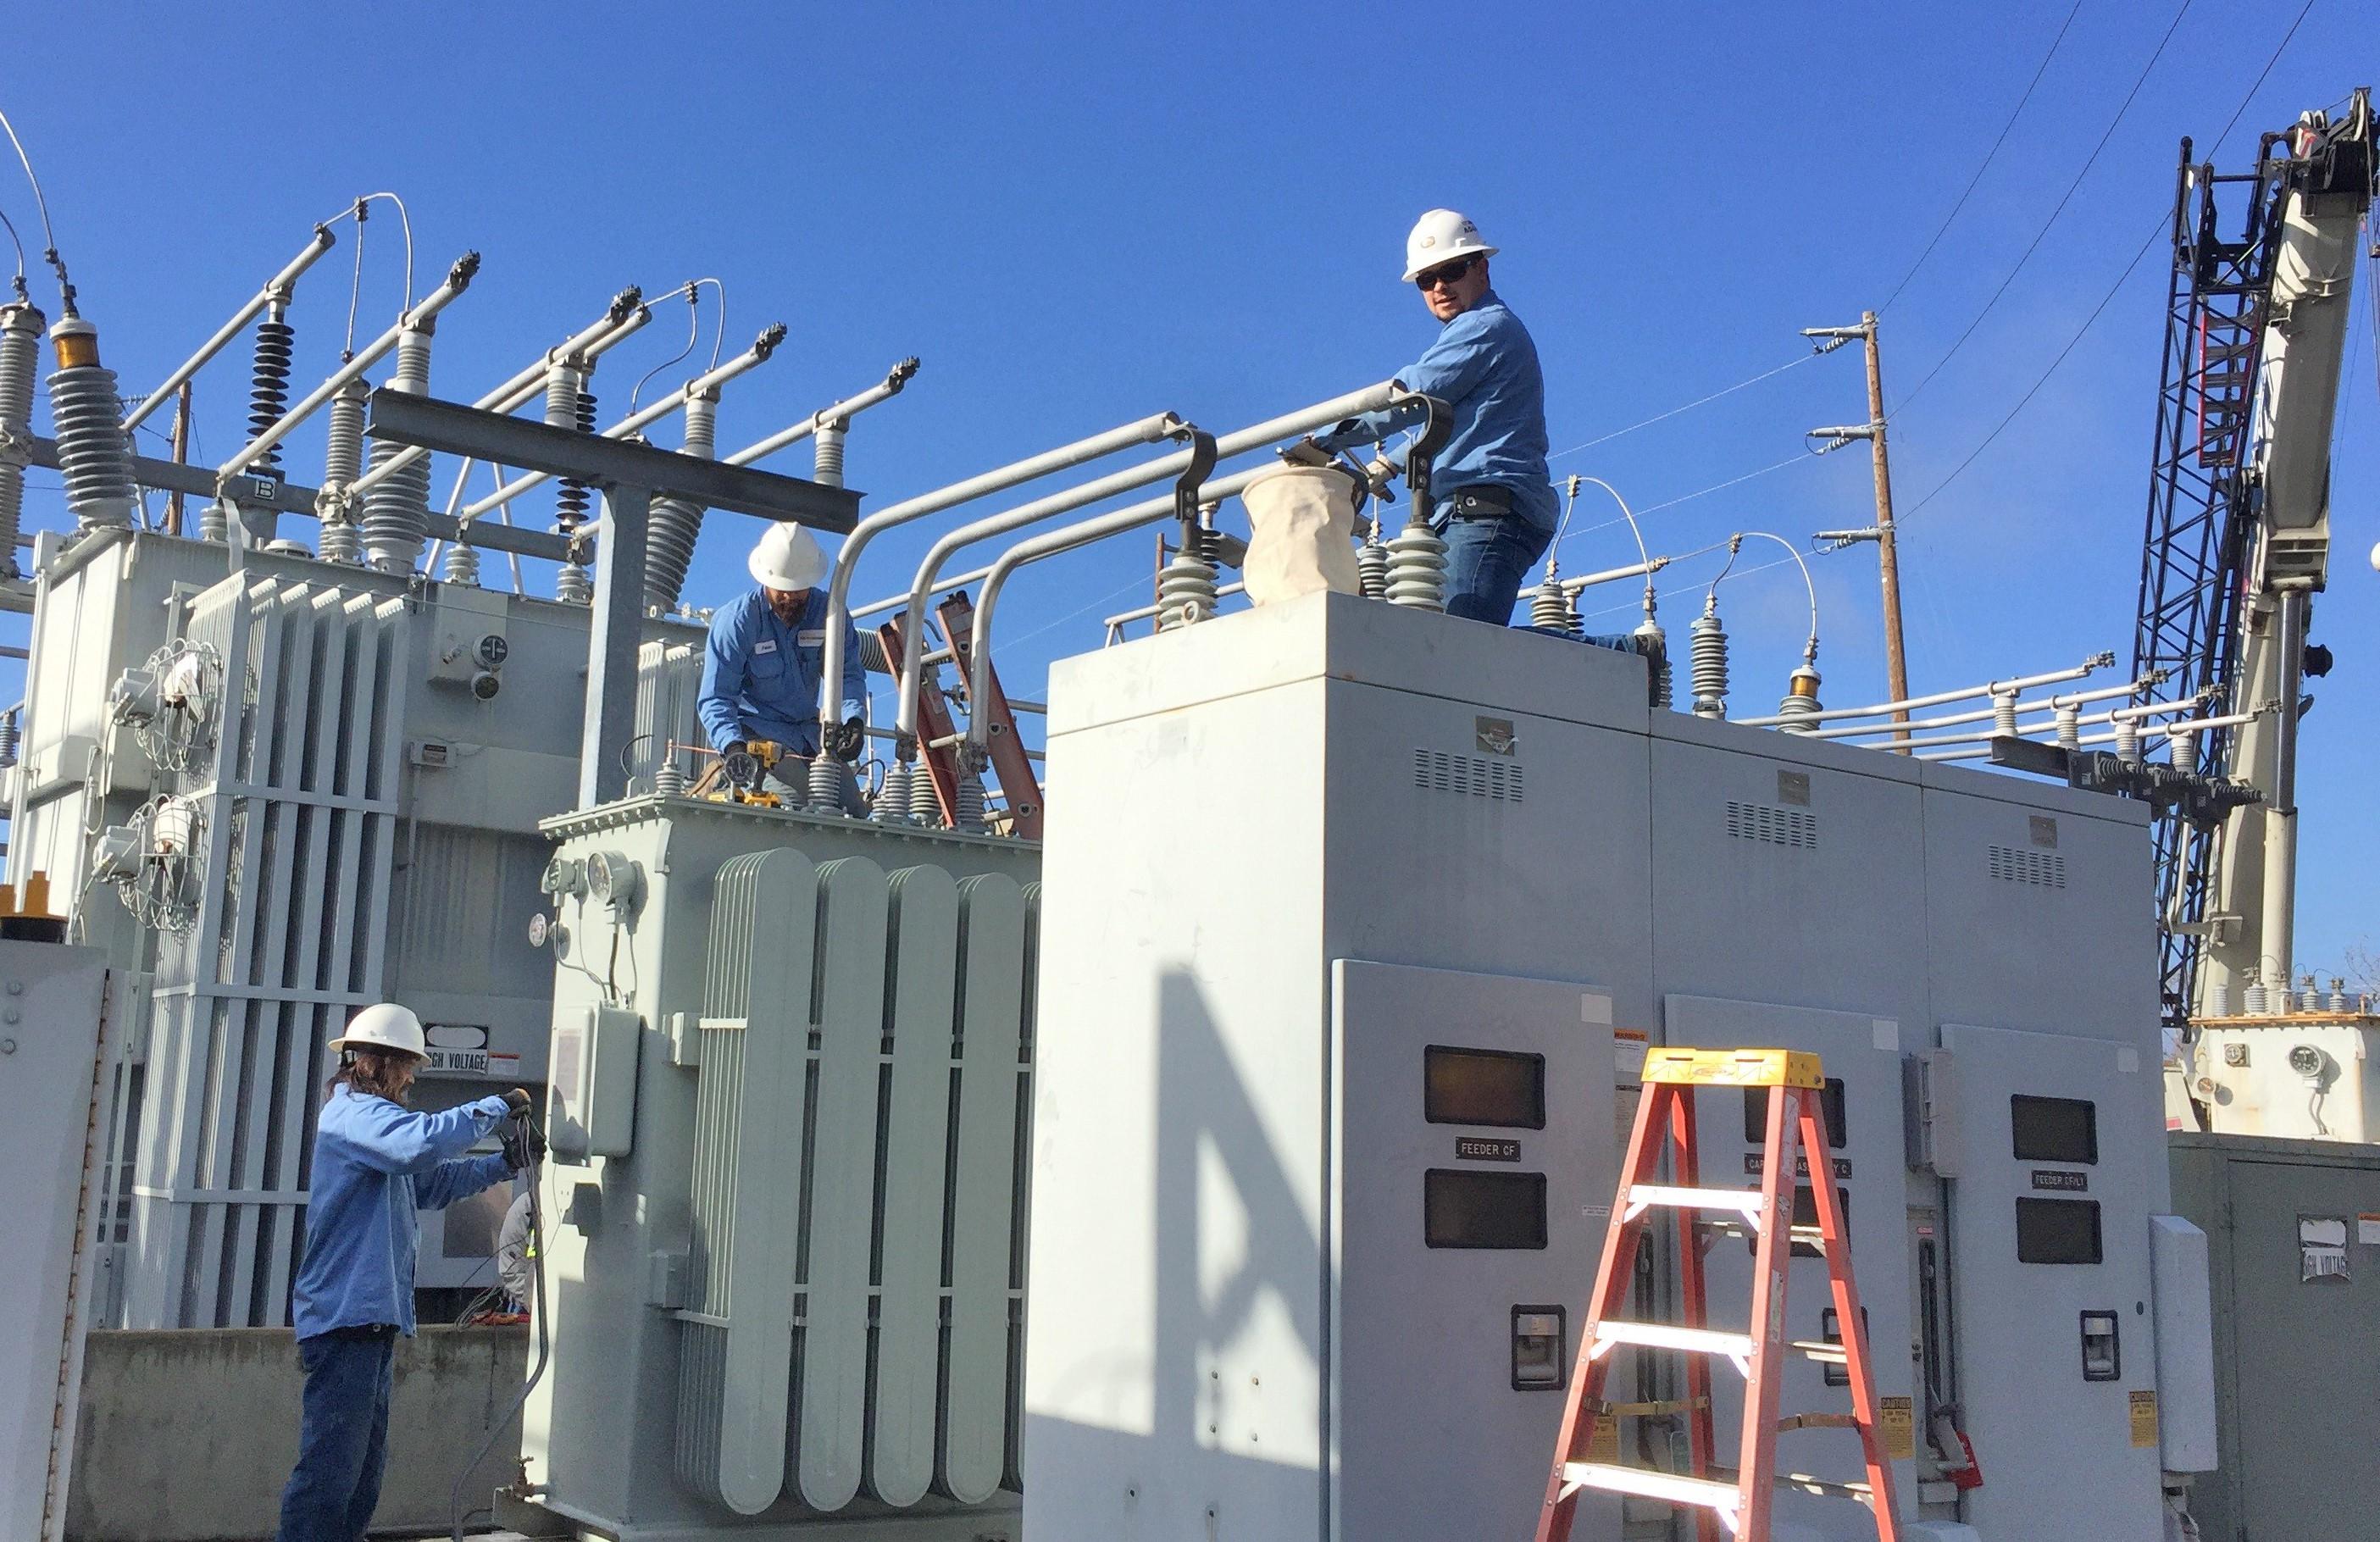 Facilities Power Substation